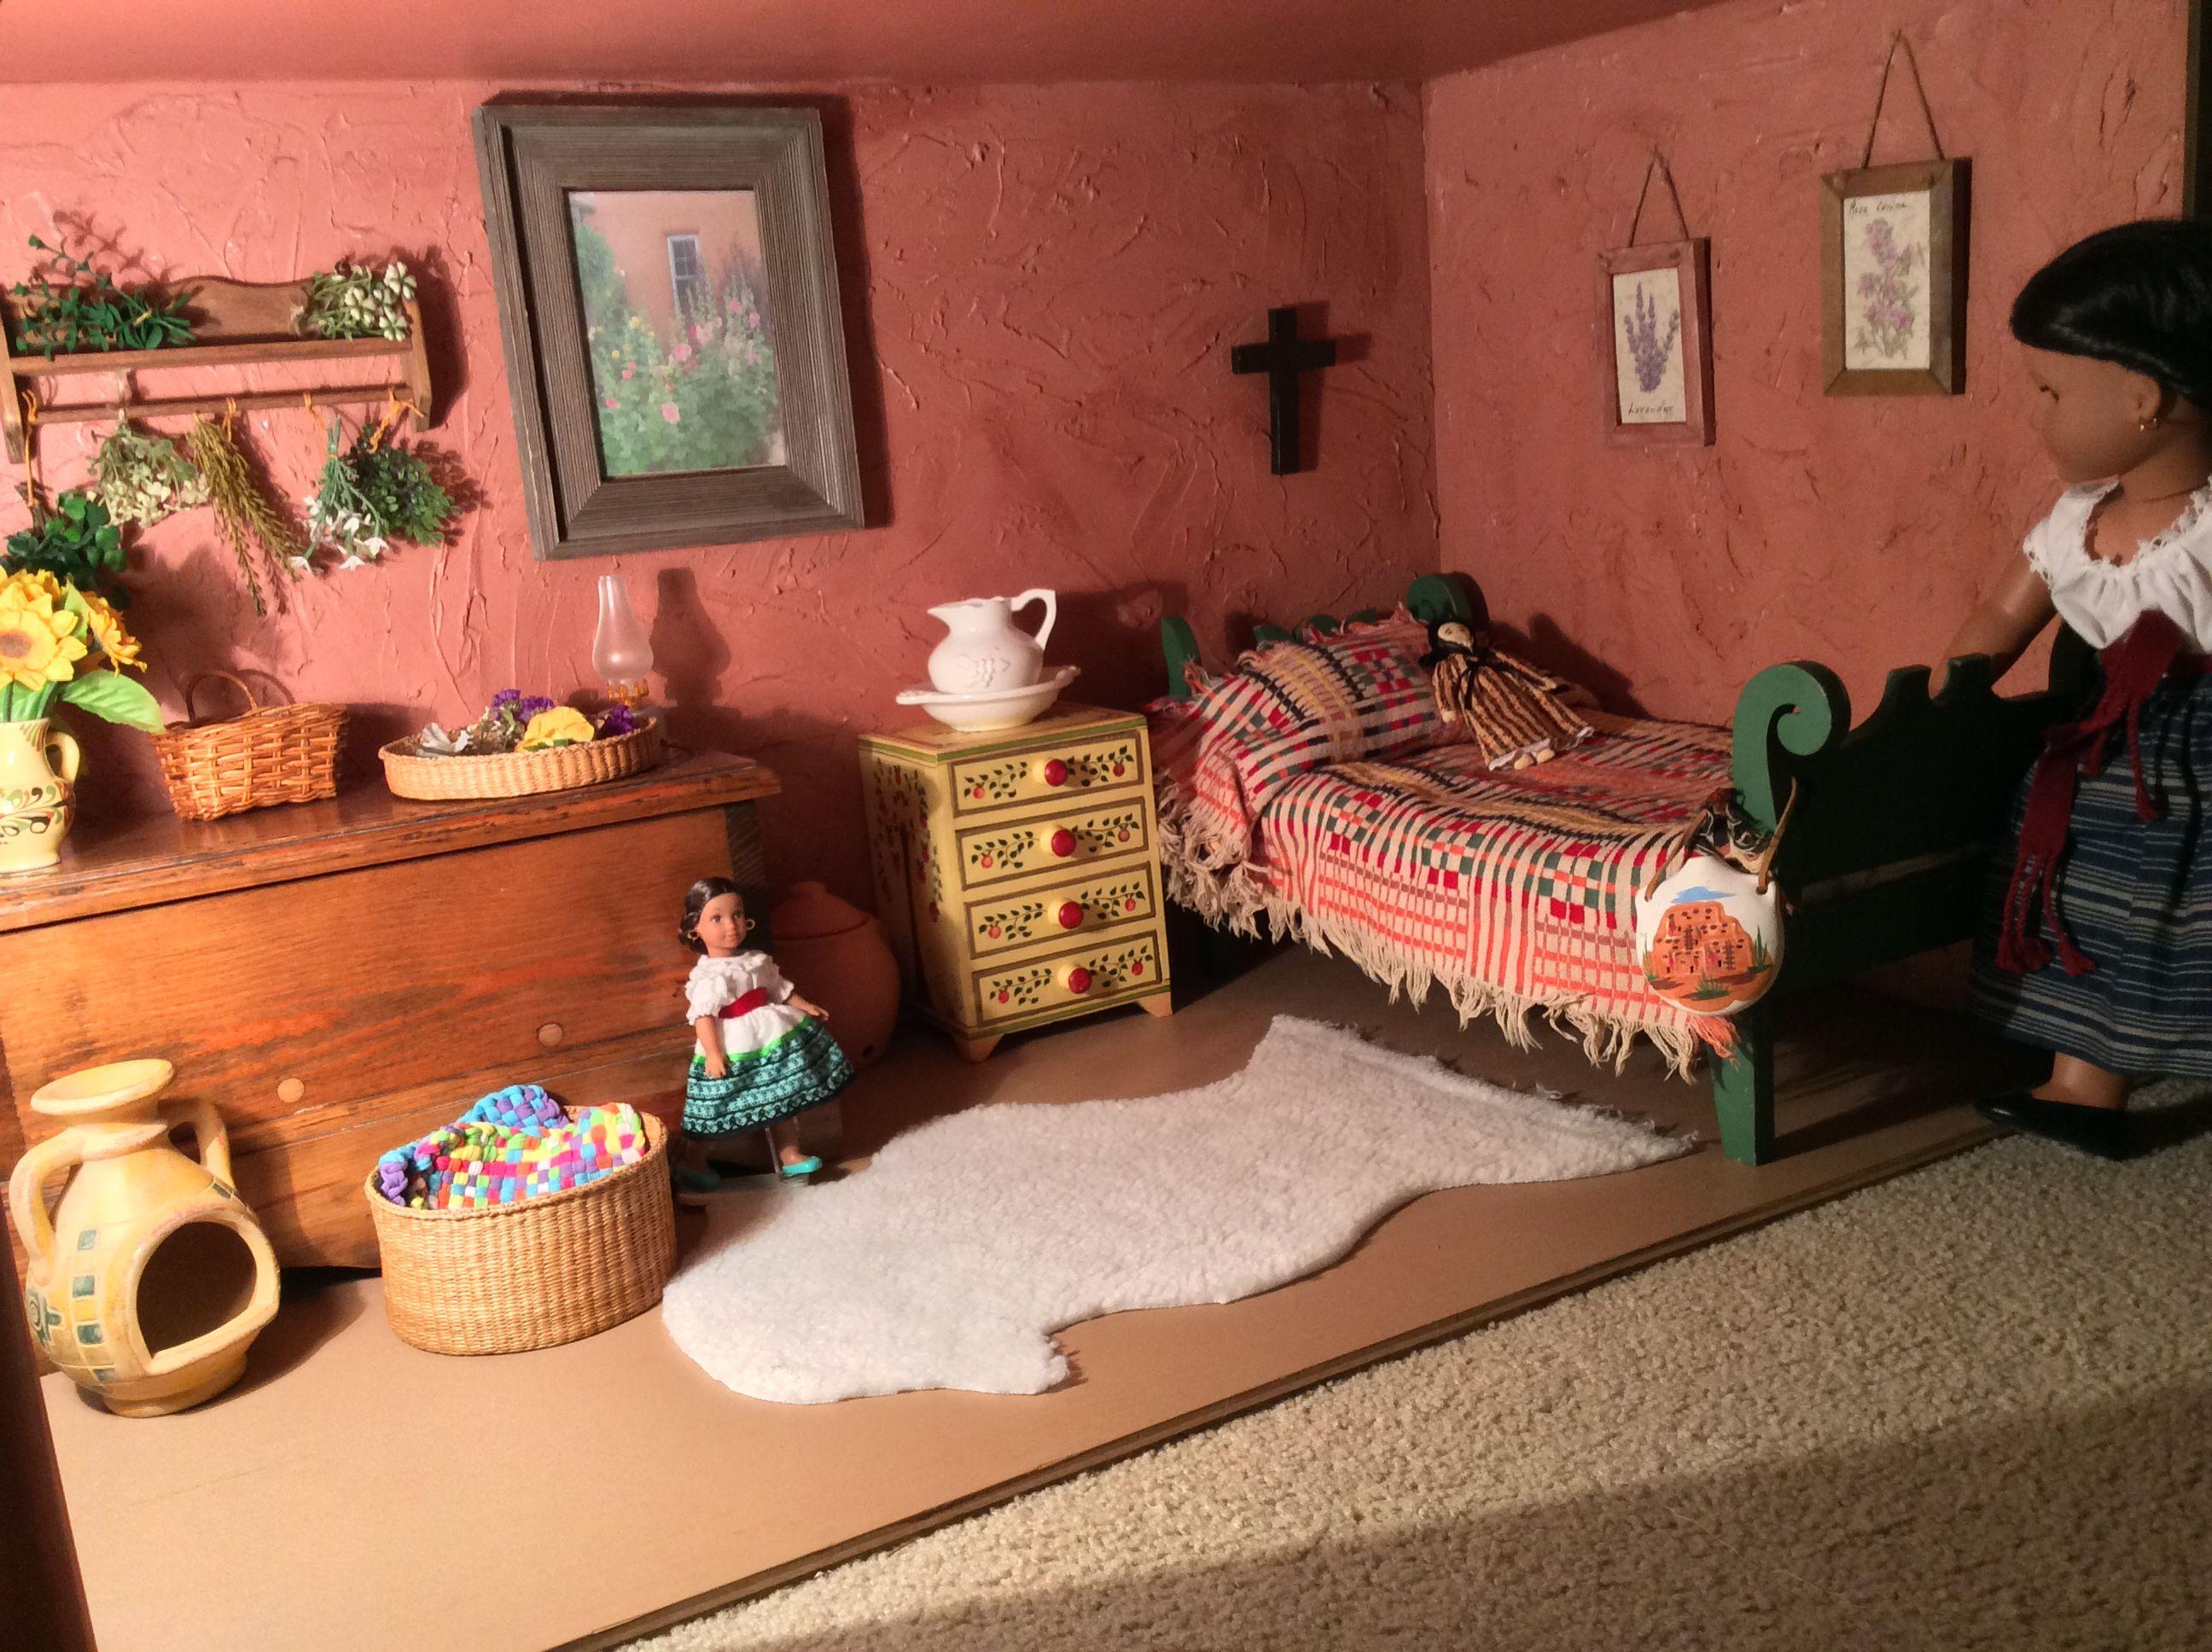 American girl josefinas bedroom by t deisher